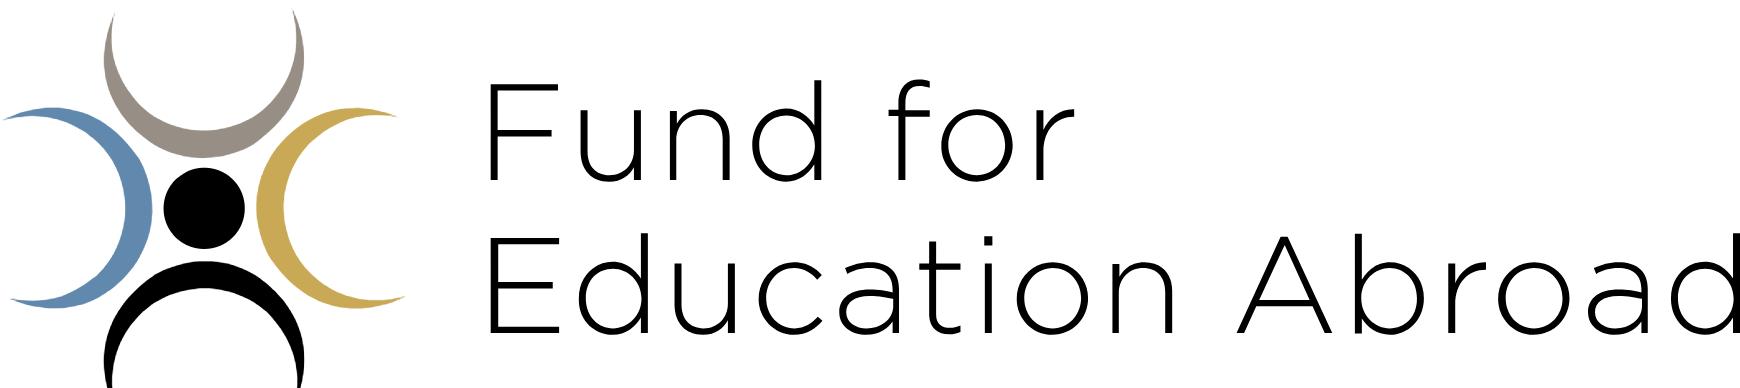 Resources   Eccles Global   David Eccles School of Business